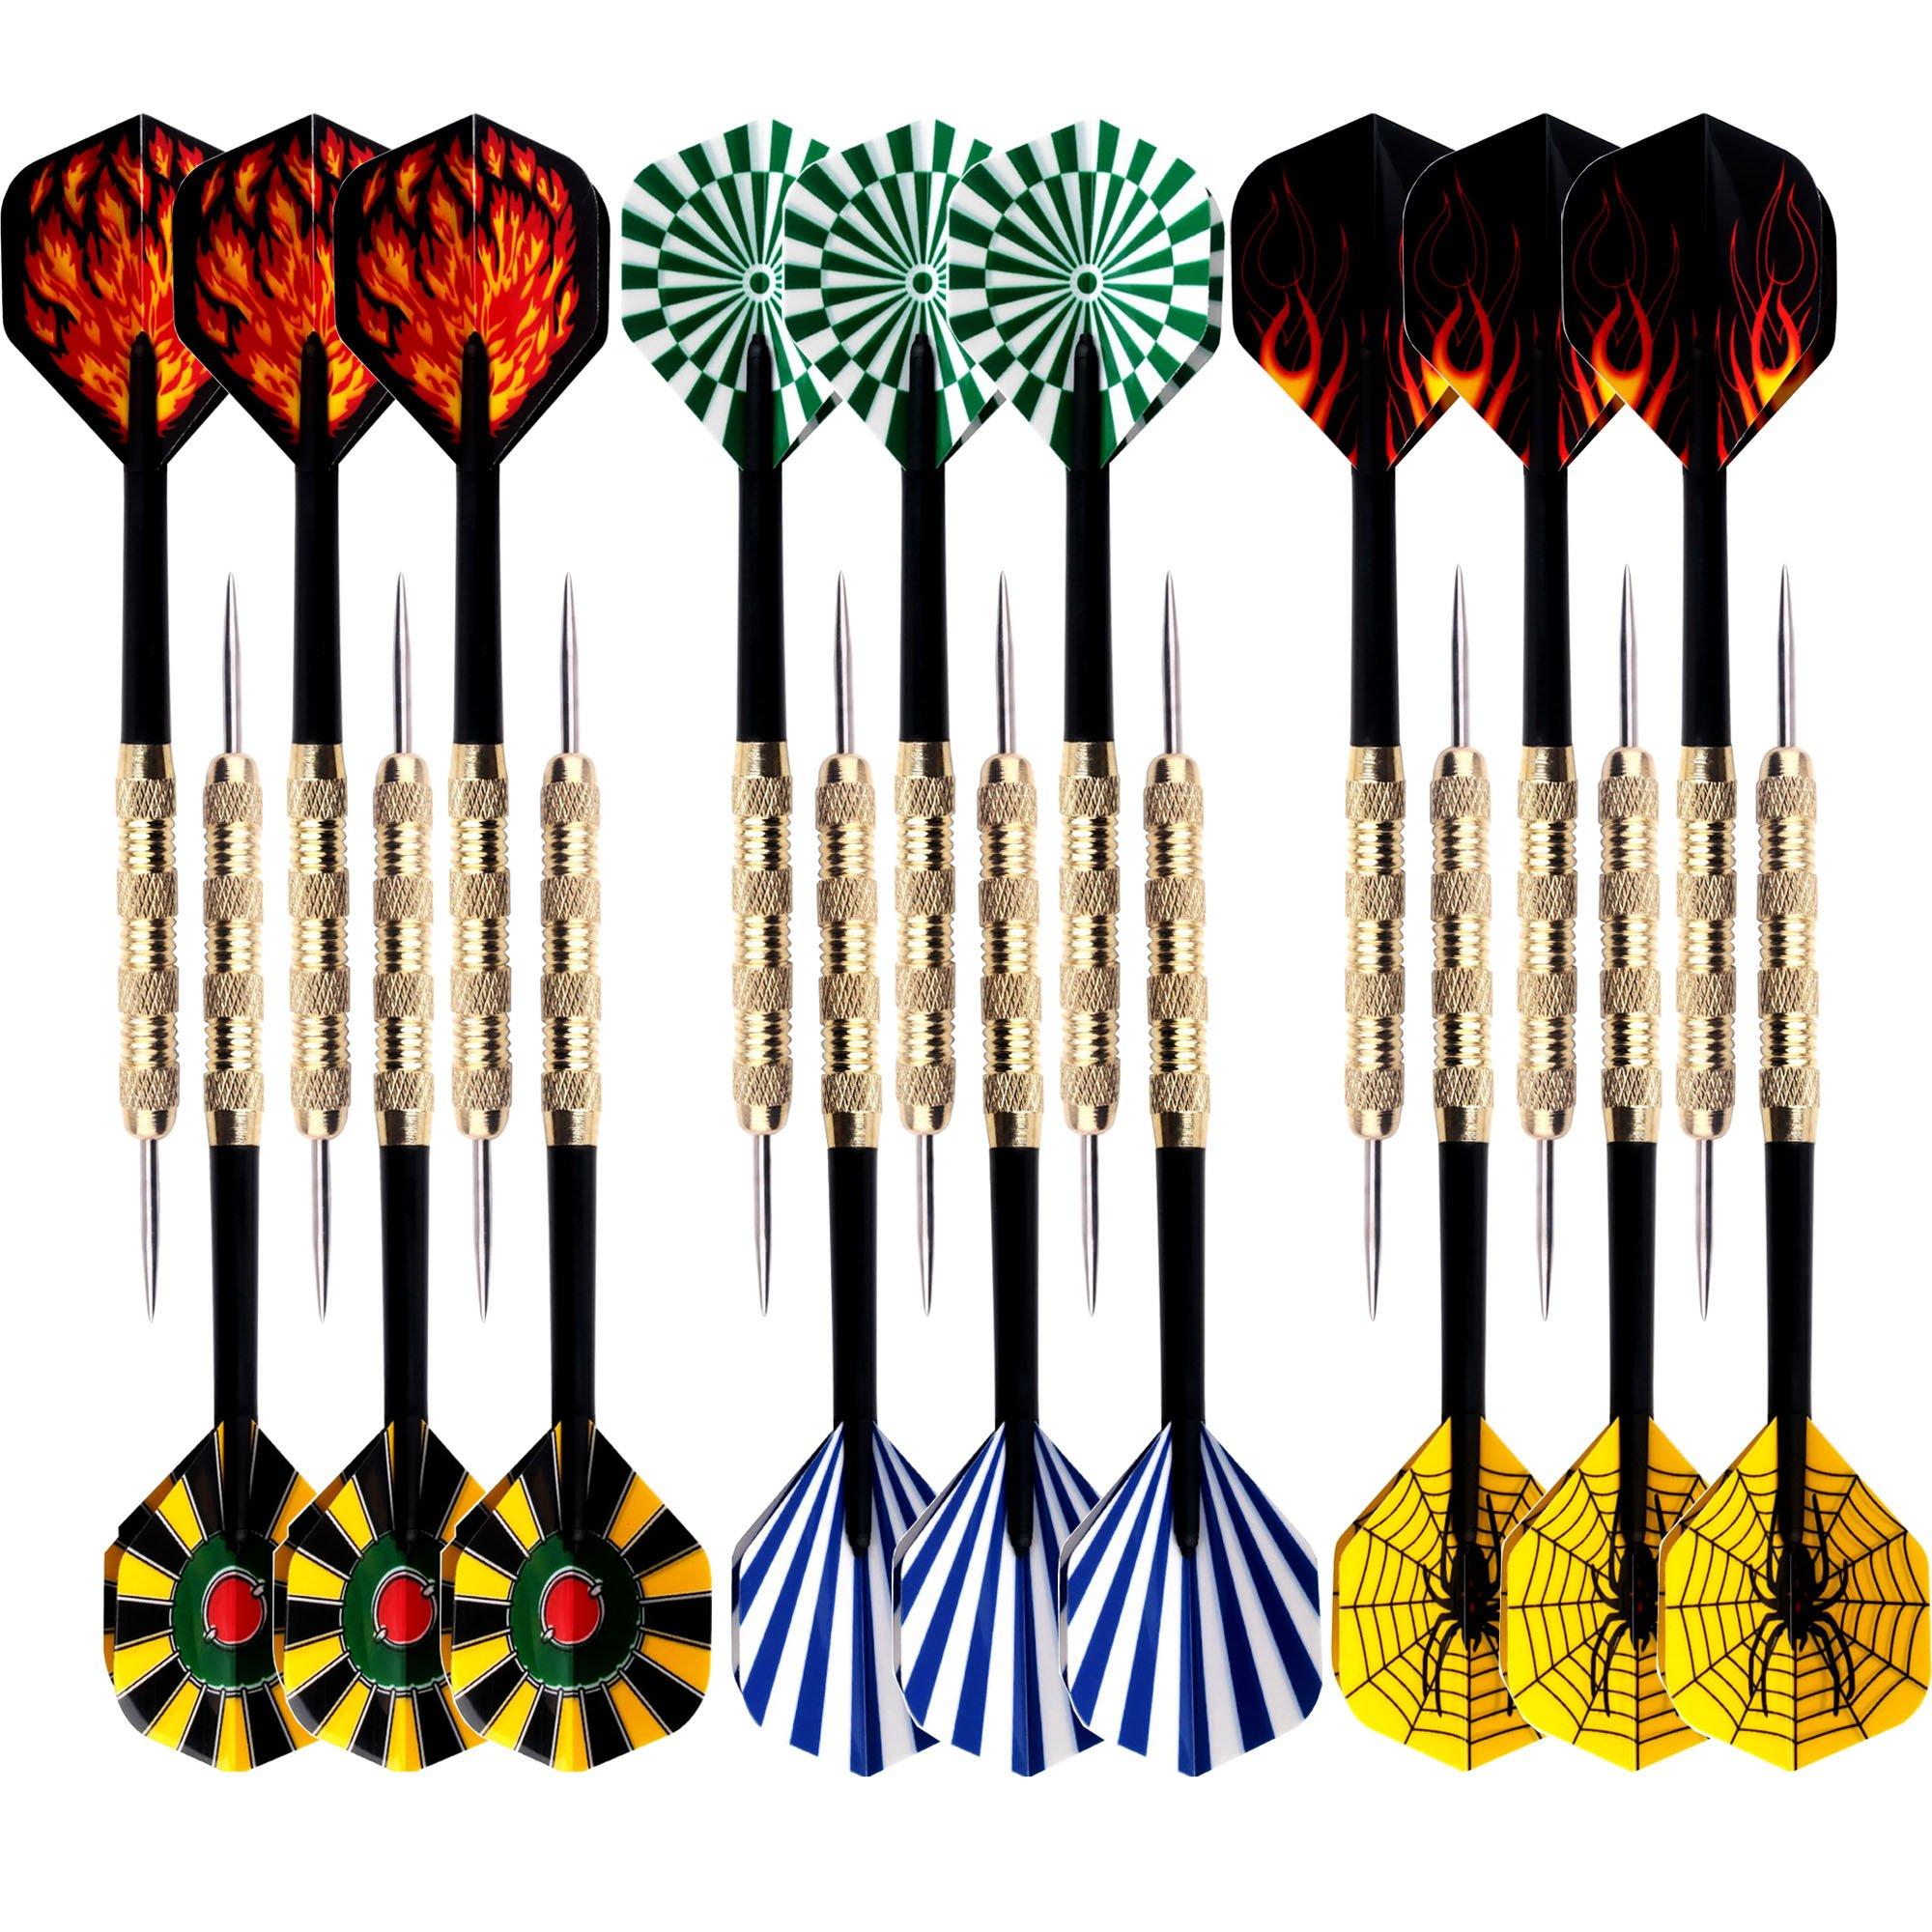 18 Packs of Steel Tip Darts Set Slim Barrel with PVC Dart Flights and Nylon Shafts